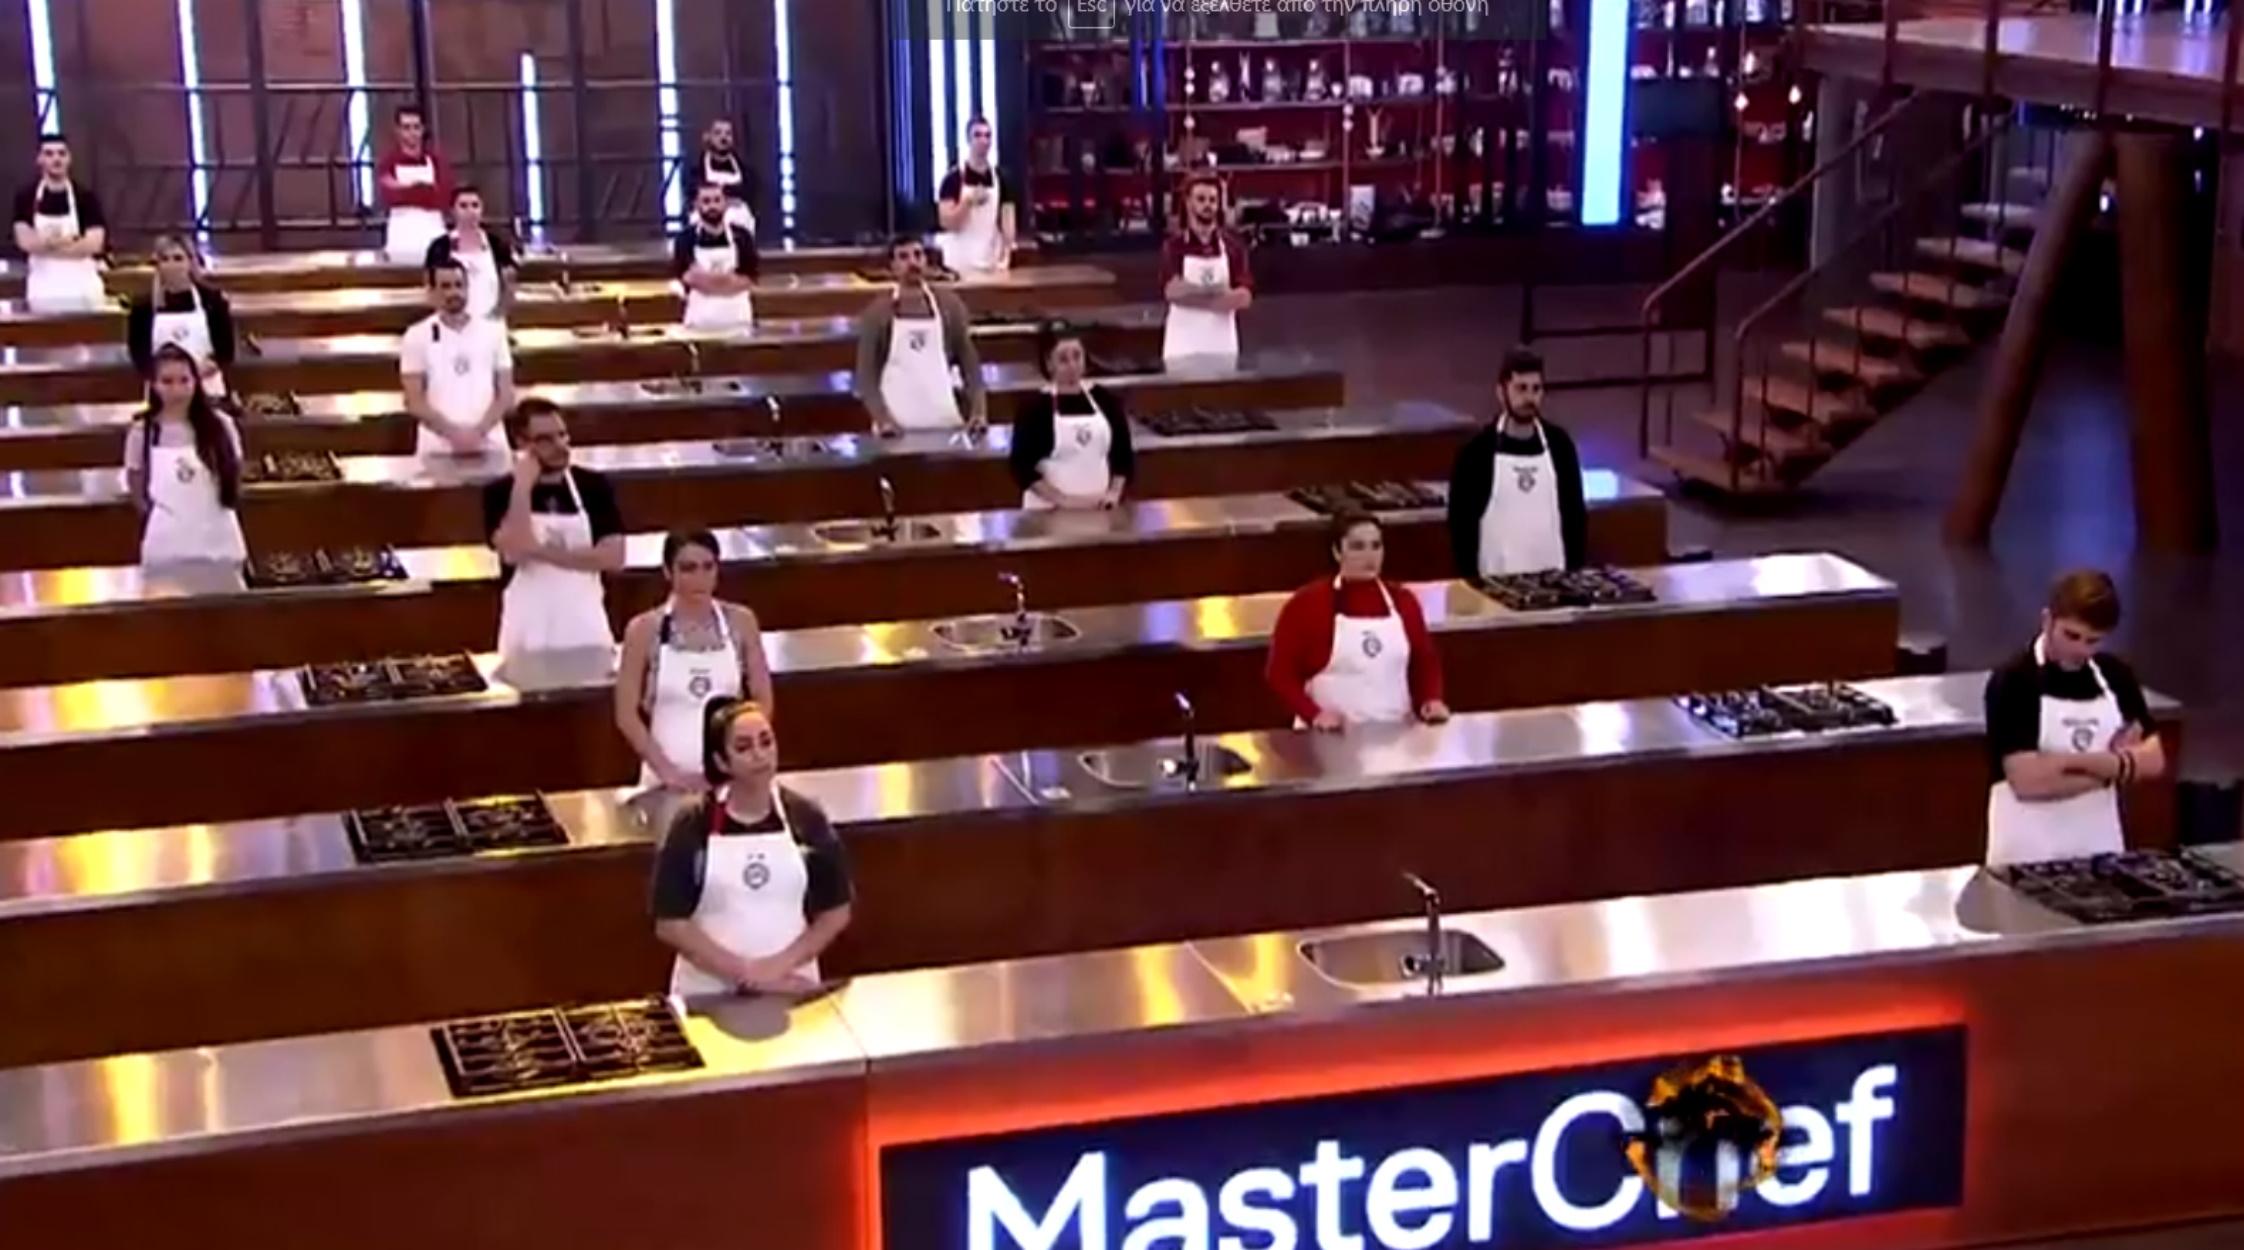 Masterchef 5: Ξεκίνησε ο πόλεμος στην κουζίνα – «Ψάξε δωμάτιο, δε σε βλέπω καλά»